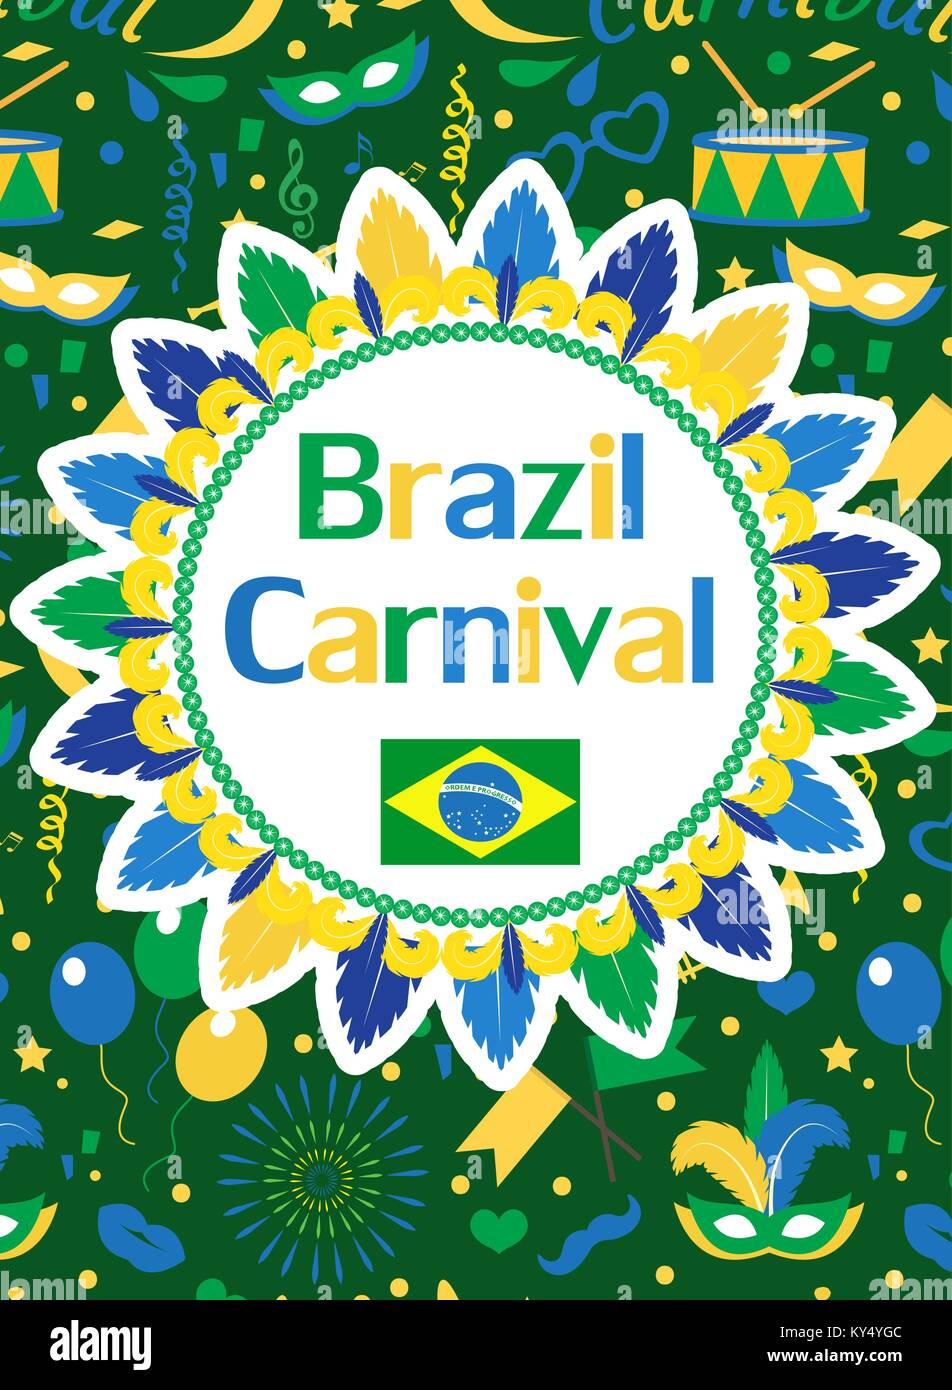 Welcome Brazil Carnival Poster Invitation Flyer Templates For Your Design Brazilian Festival Masquerade Background Rio De Janeiro Travel Concept